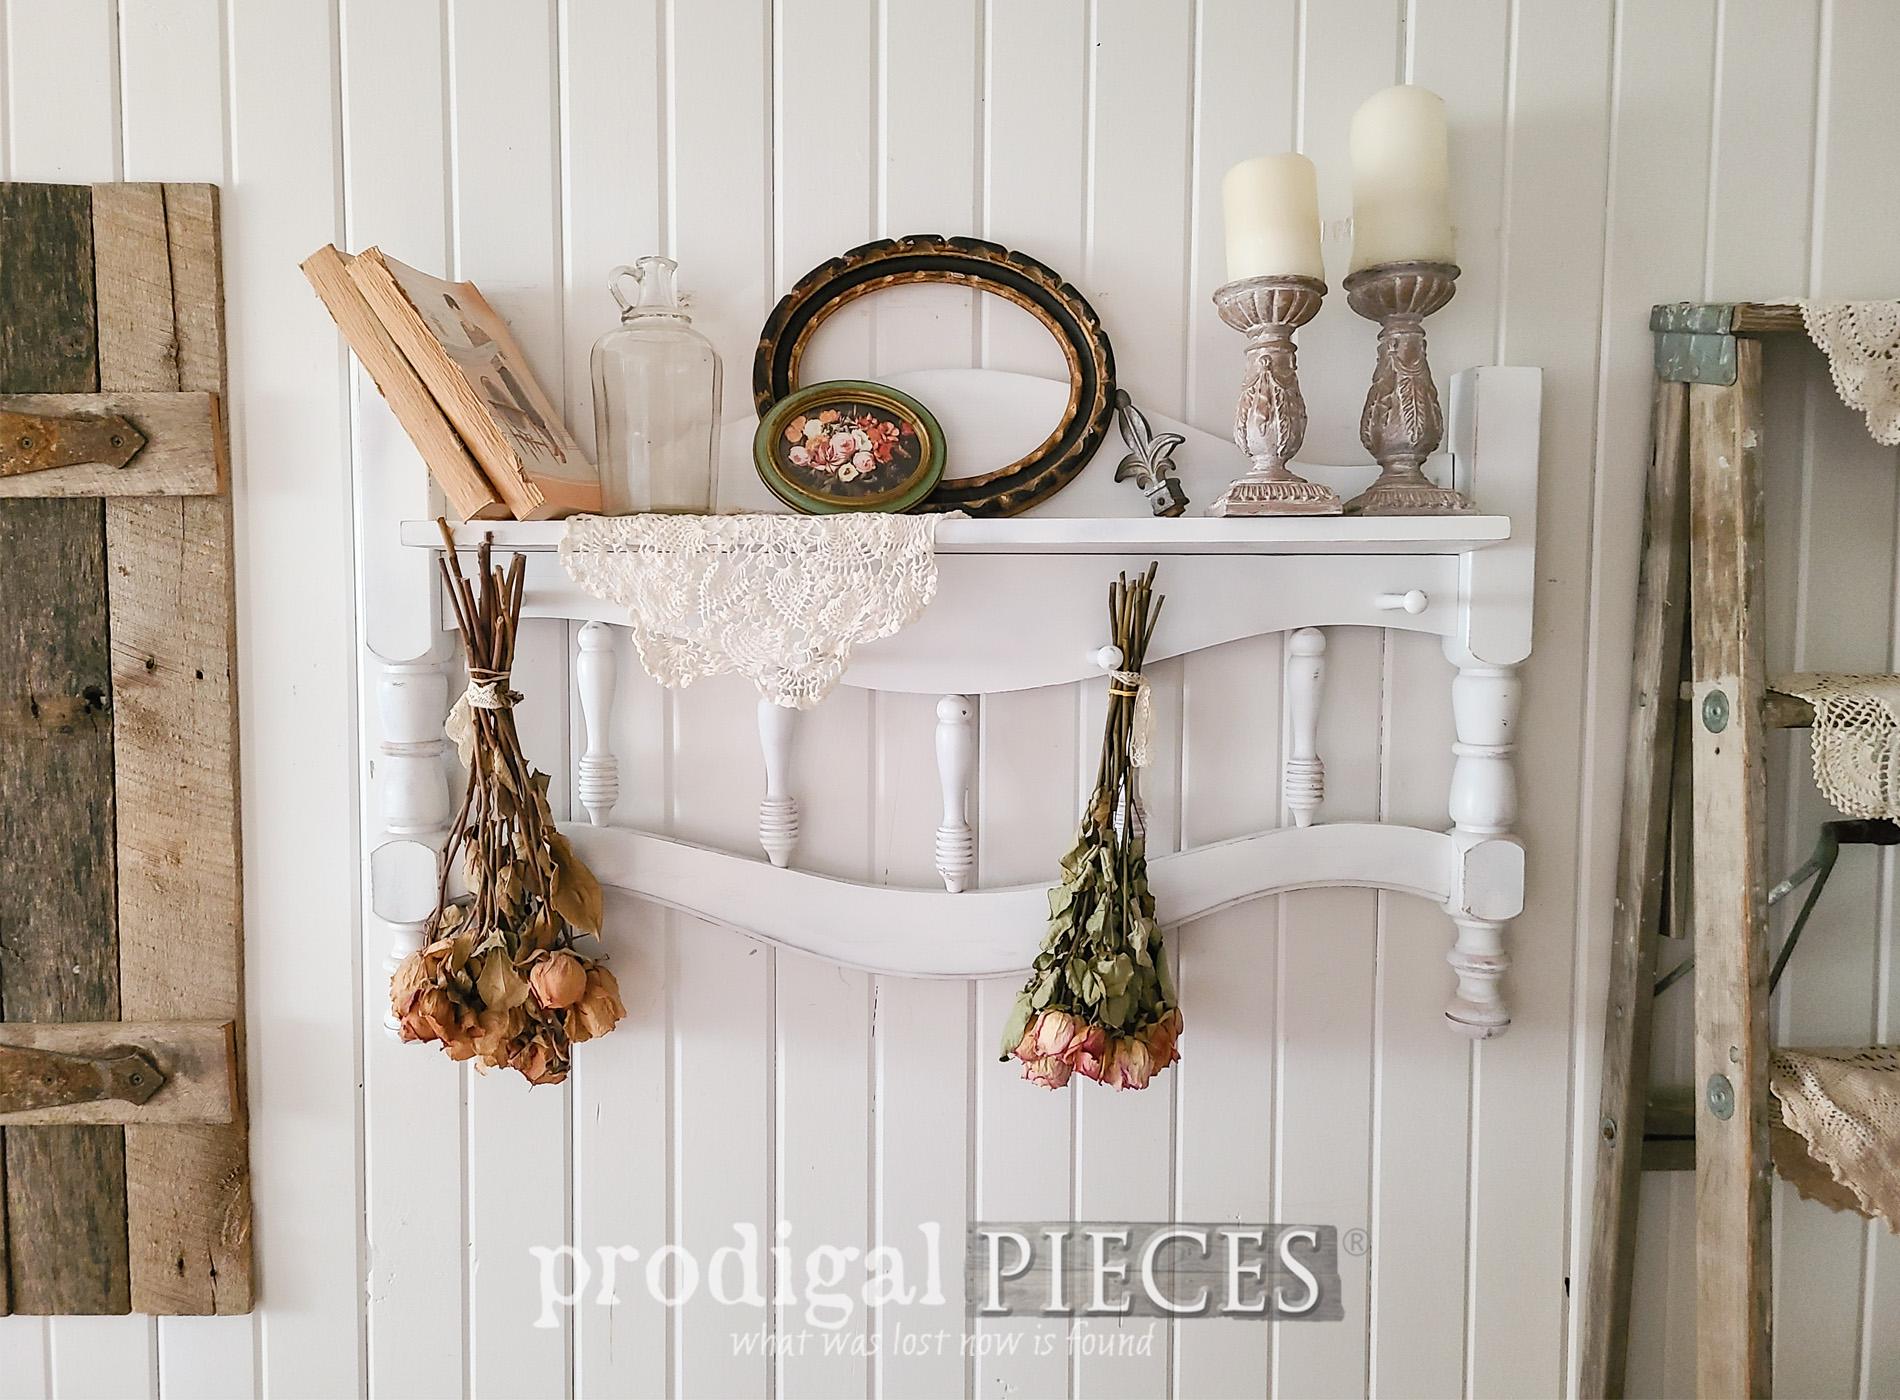 Featured Upcycled Headboard by Larissa of Prodigal Pieces | prodigalpieces.com #prodigalpieces #upcycled #diy #farmhouse #cottage #shabbychic #homedecor